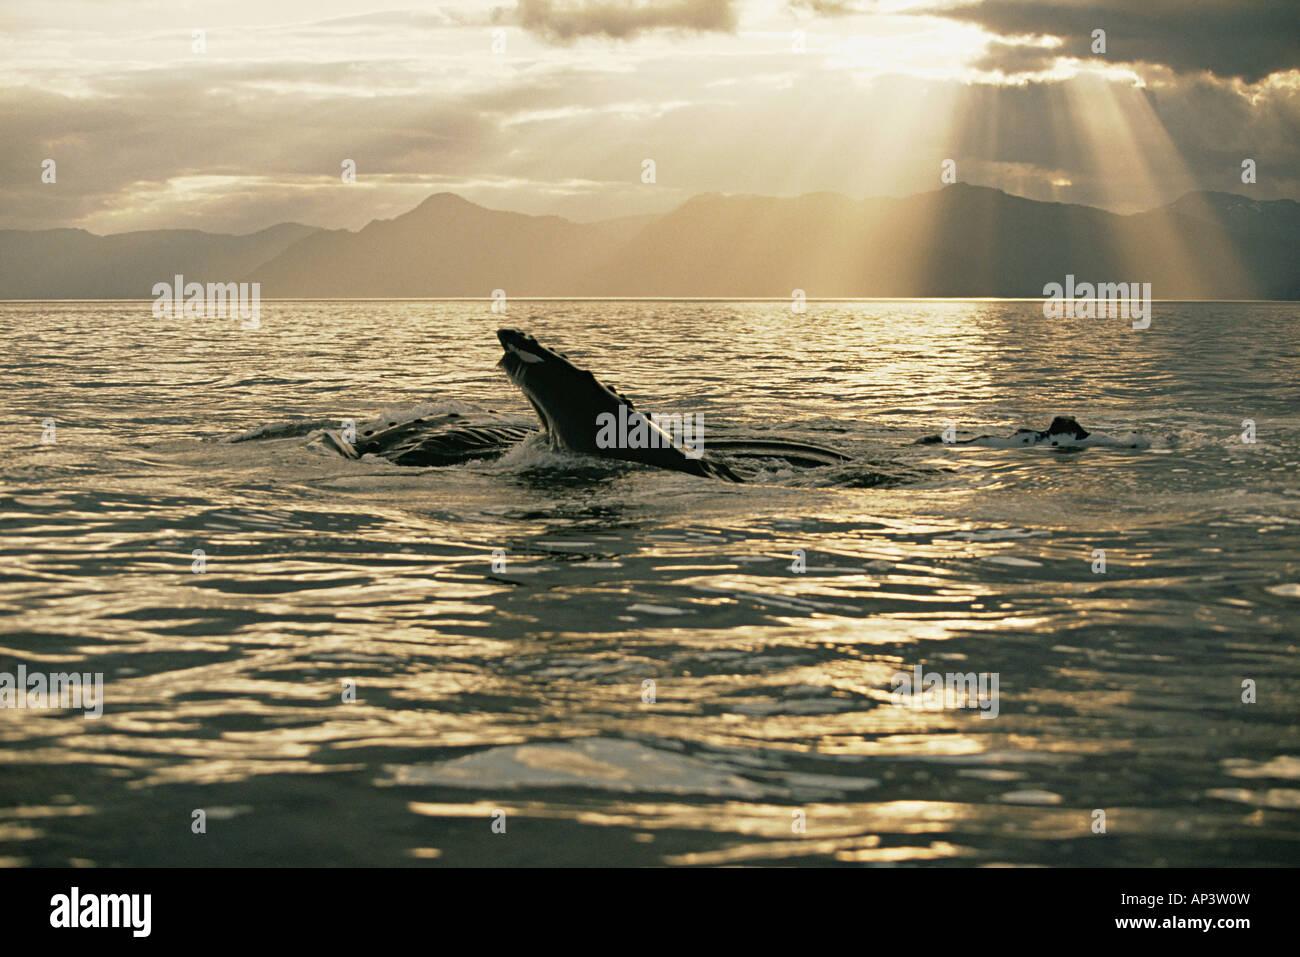 Lunge feeding humpback whale - Stock Image